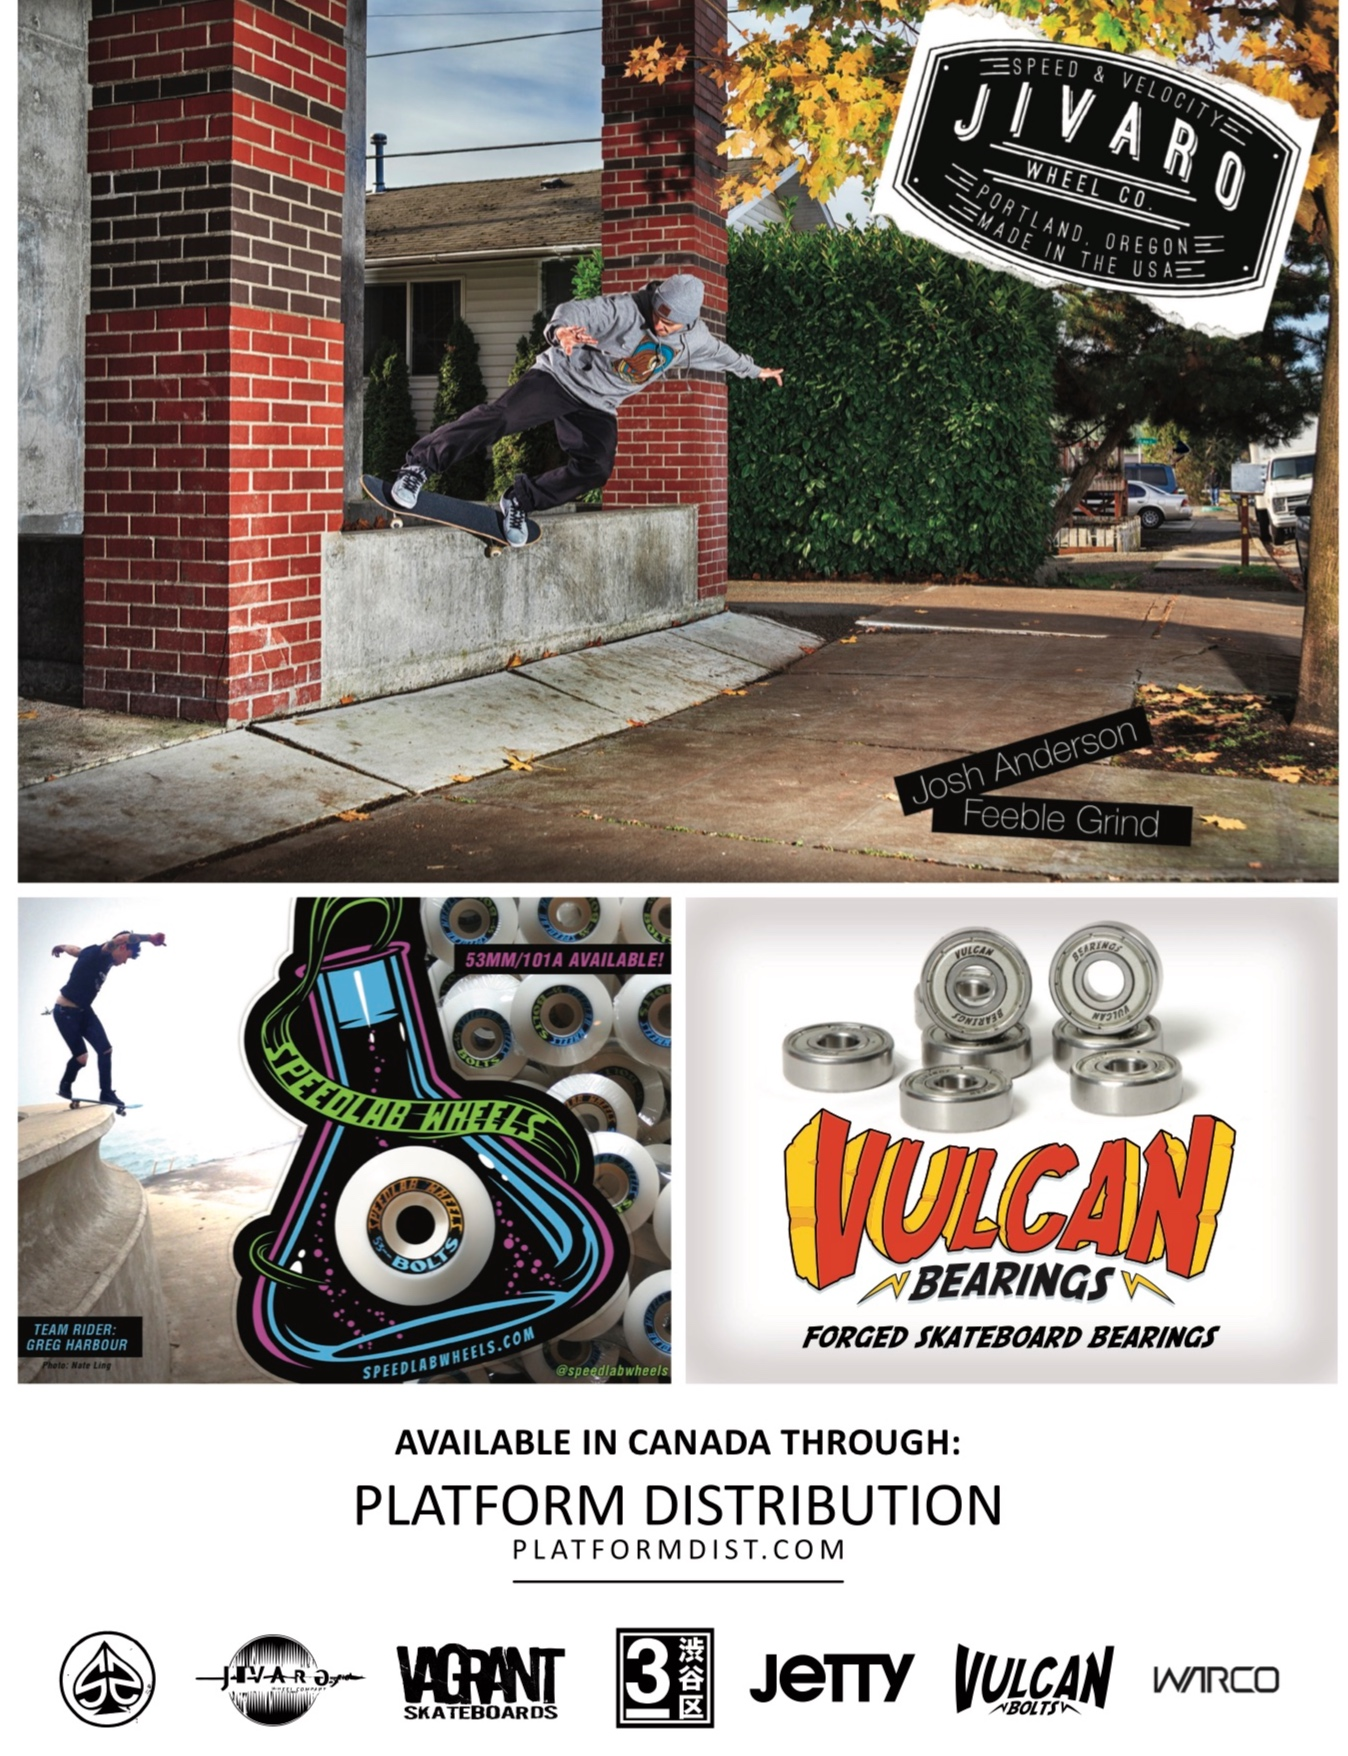 Jivaro Wheels, Speedlab Wheels and Vulcan Bearings ad from Concrete Magazine